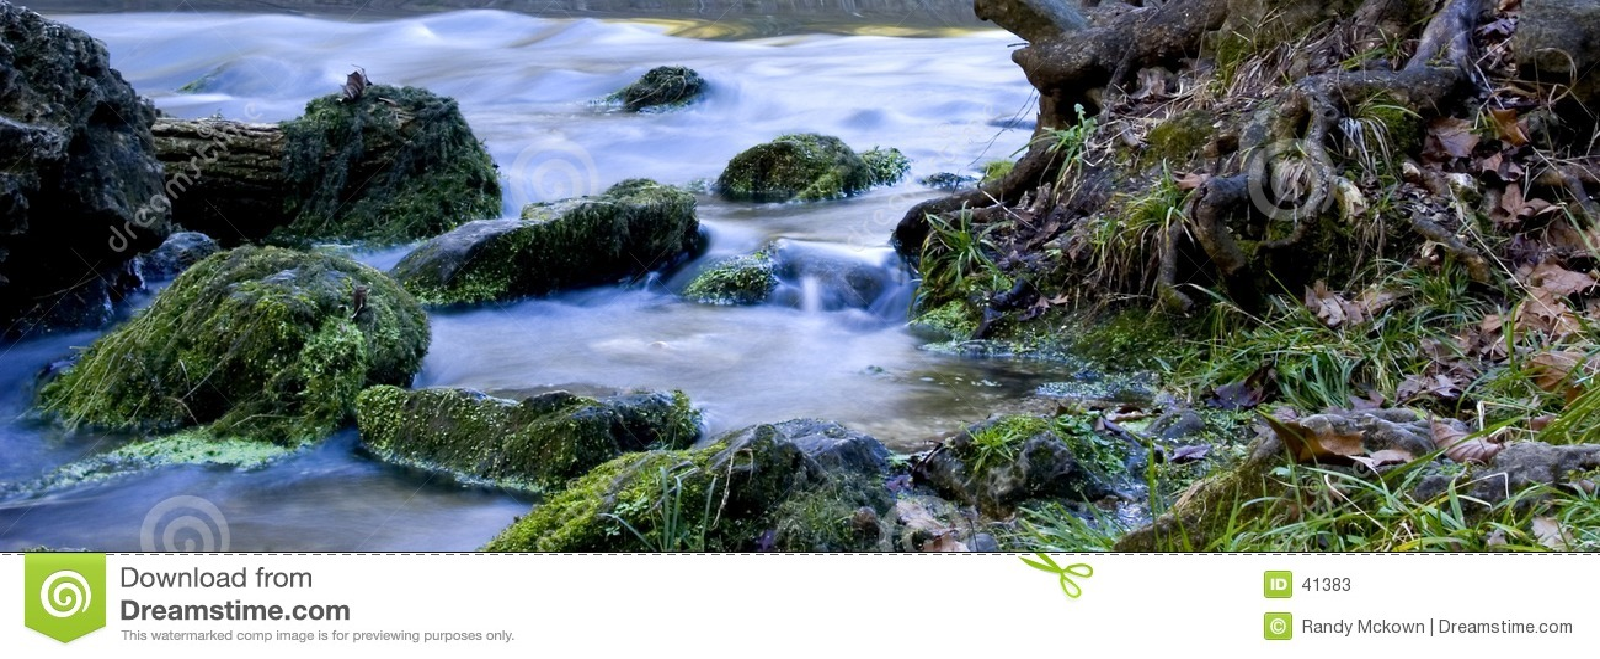 Panorama creek